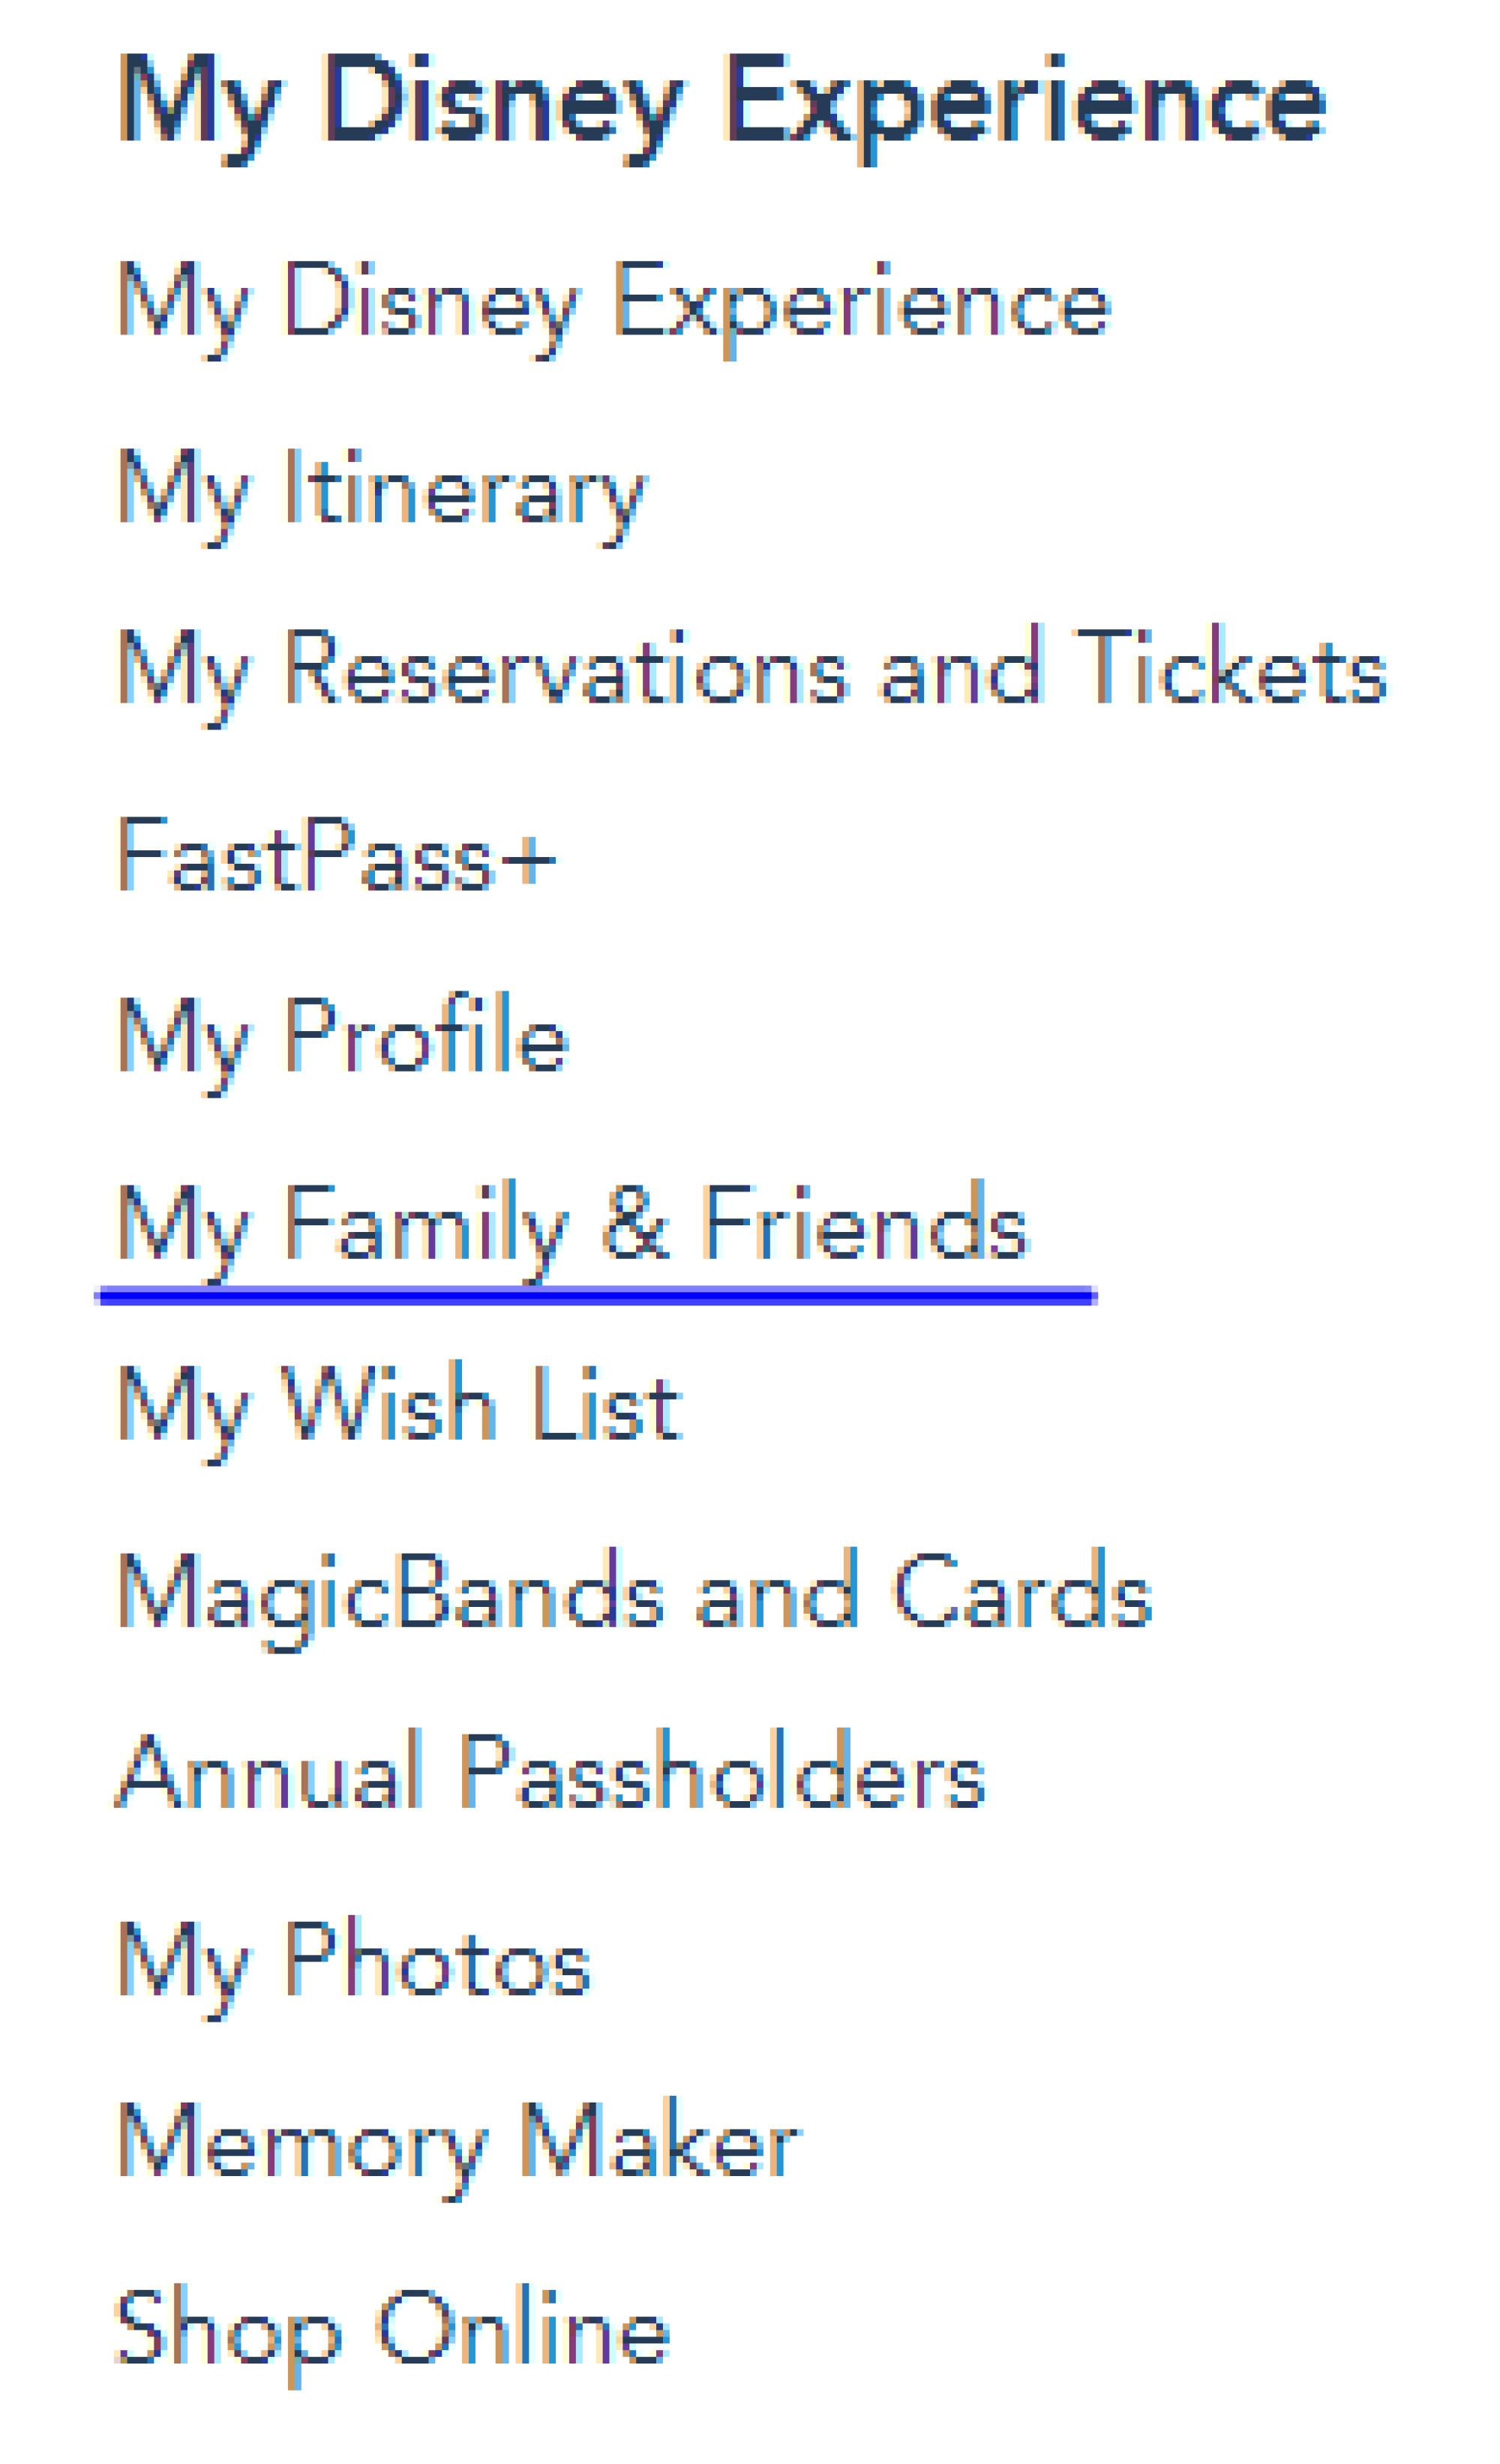 「My Family & Friends」をクリック